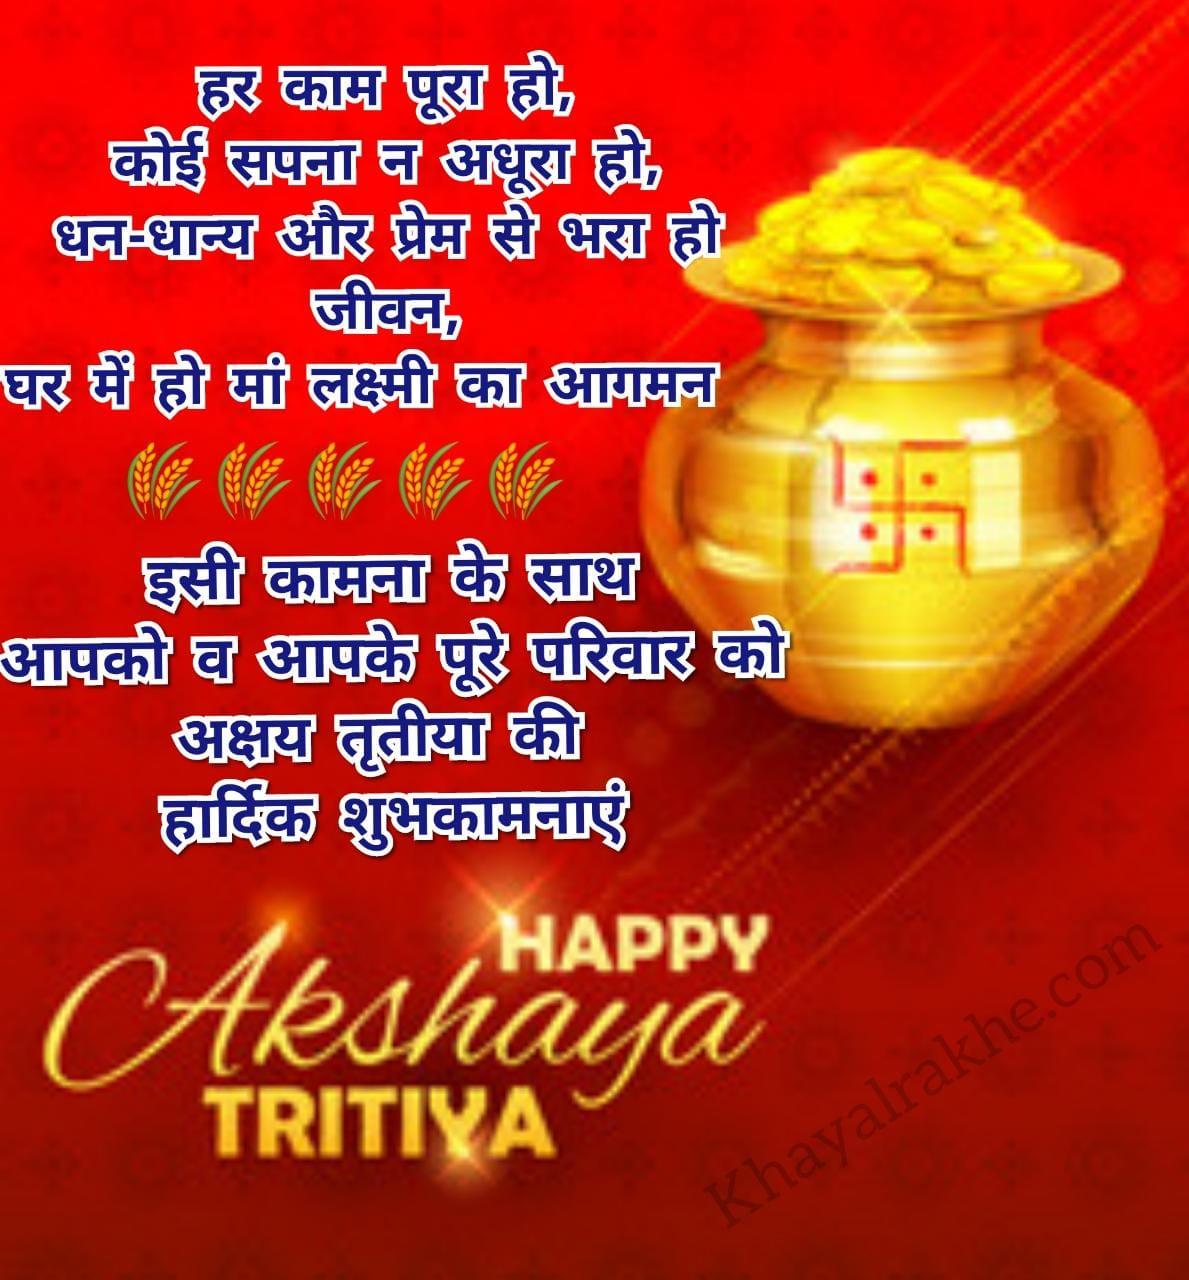 Happy Akshaya Tritiya Messages, Wishes In Hindi